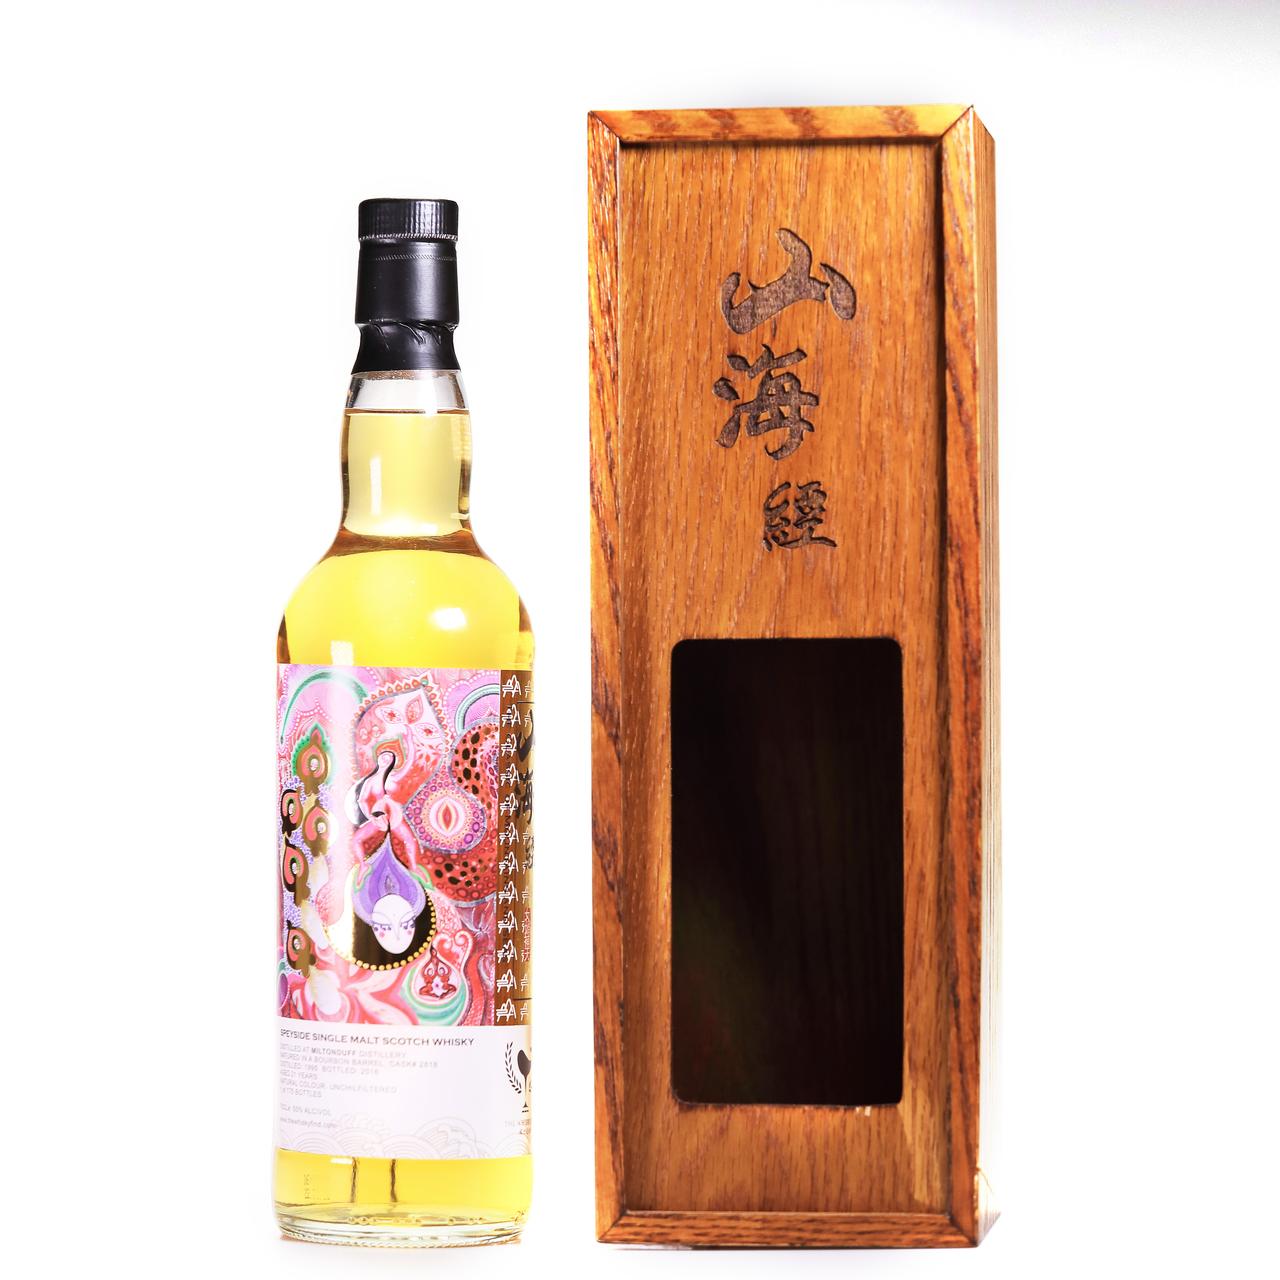 Miltonduff 1995 the whisky find 21 year old  2818 %e5%b1%b1%e6%b5%b7%e7%b6%93